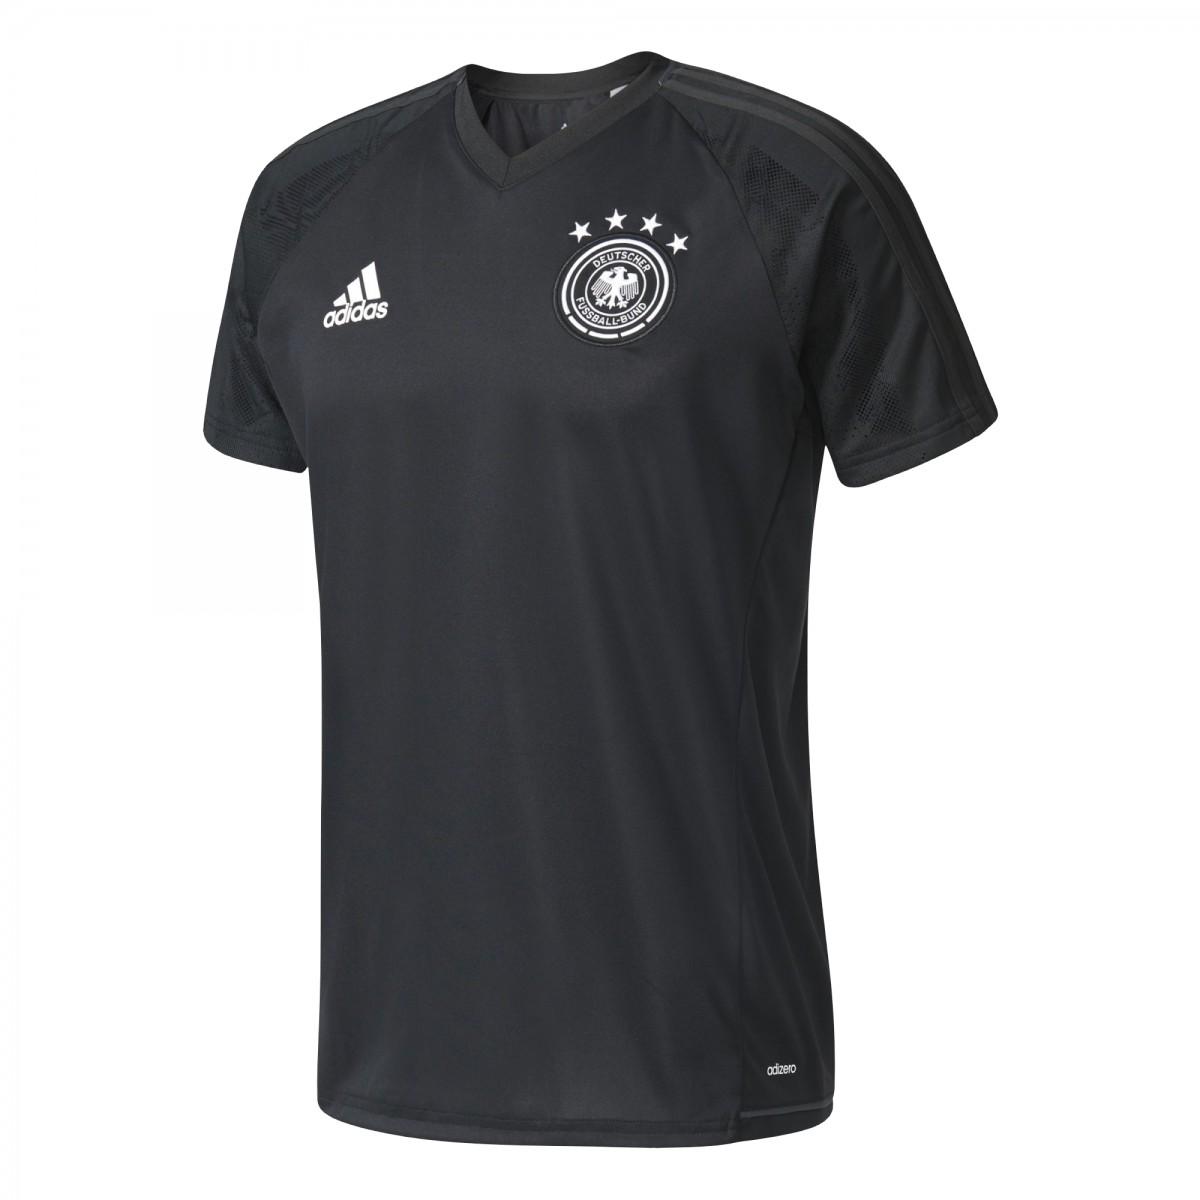 9d39ad785f Camisa Adidas Treino Alemanha